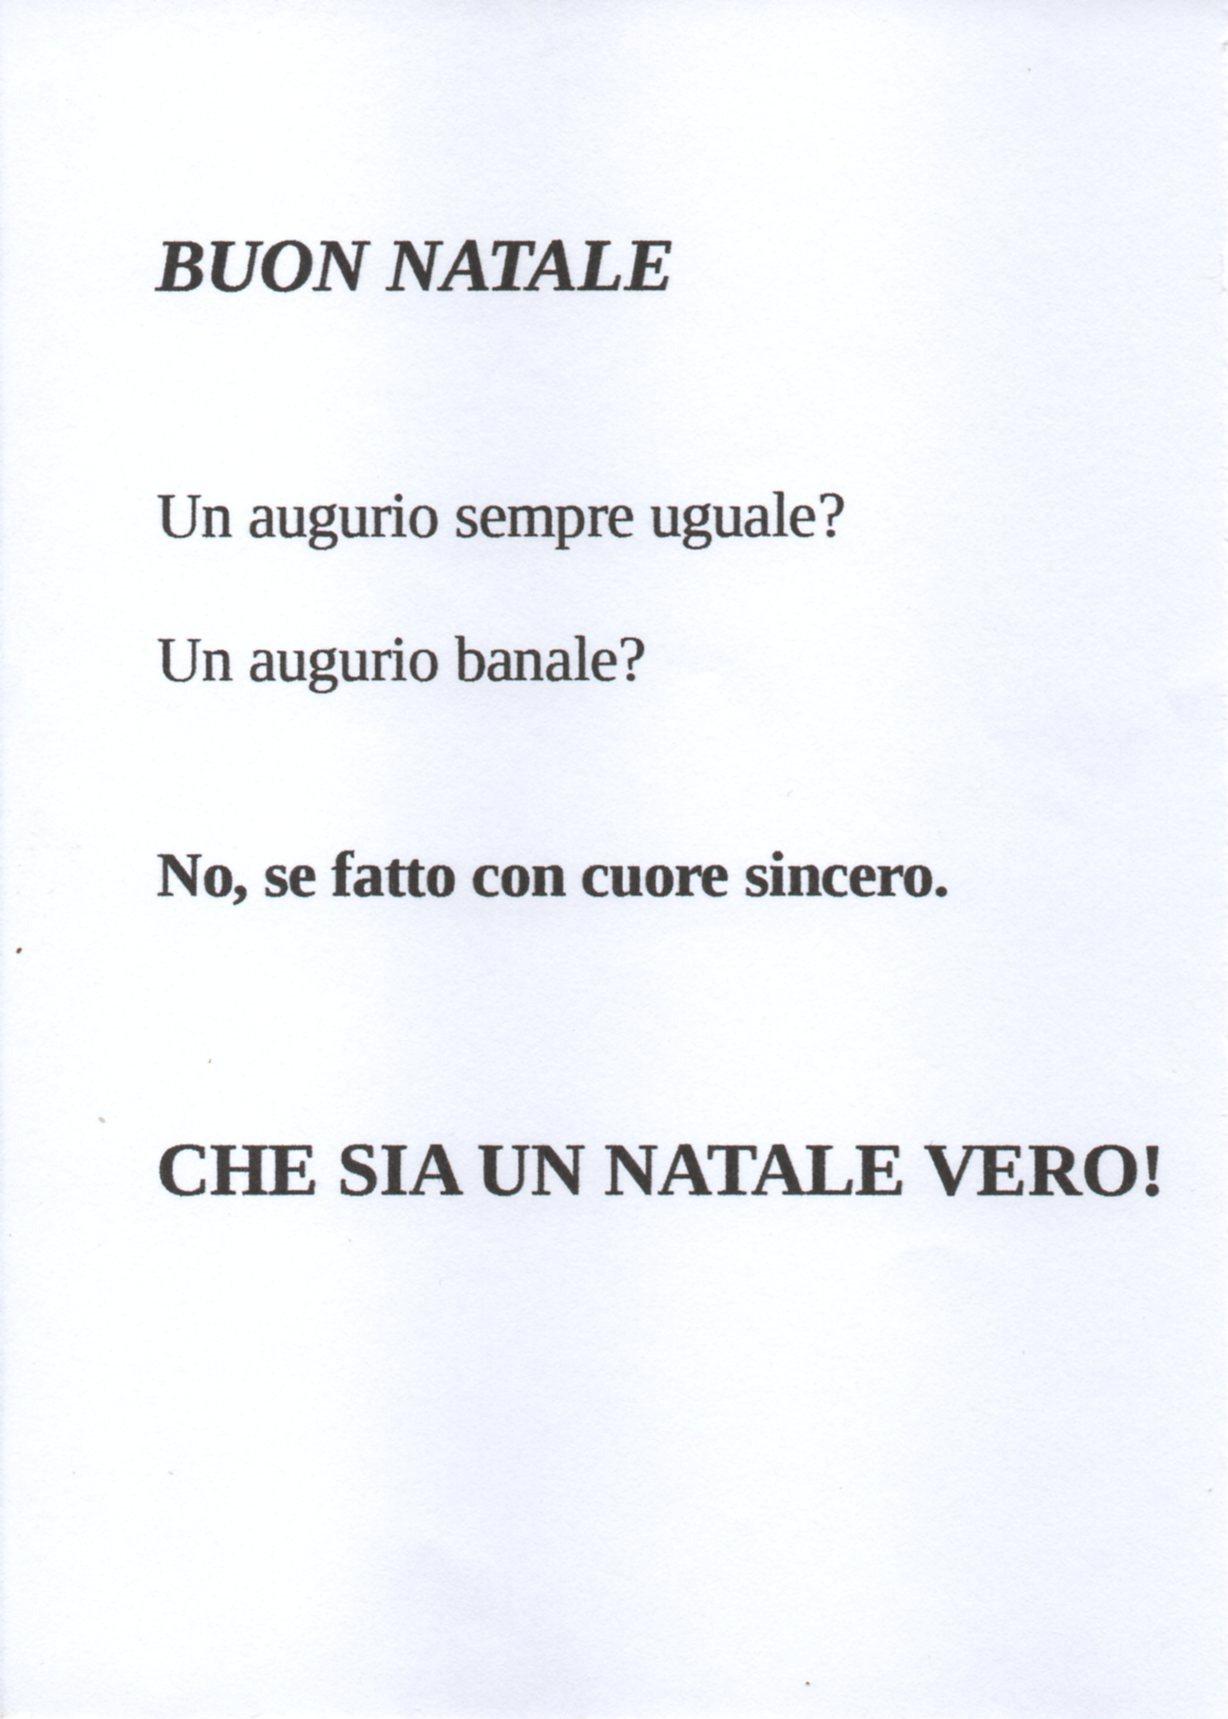 BIGLIETTINO006